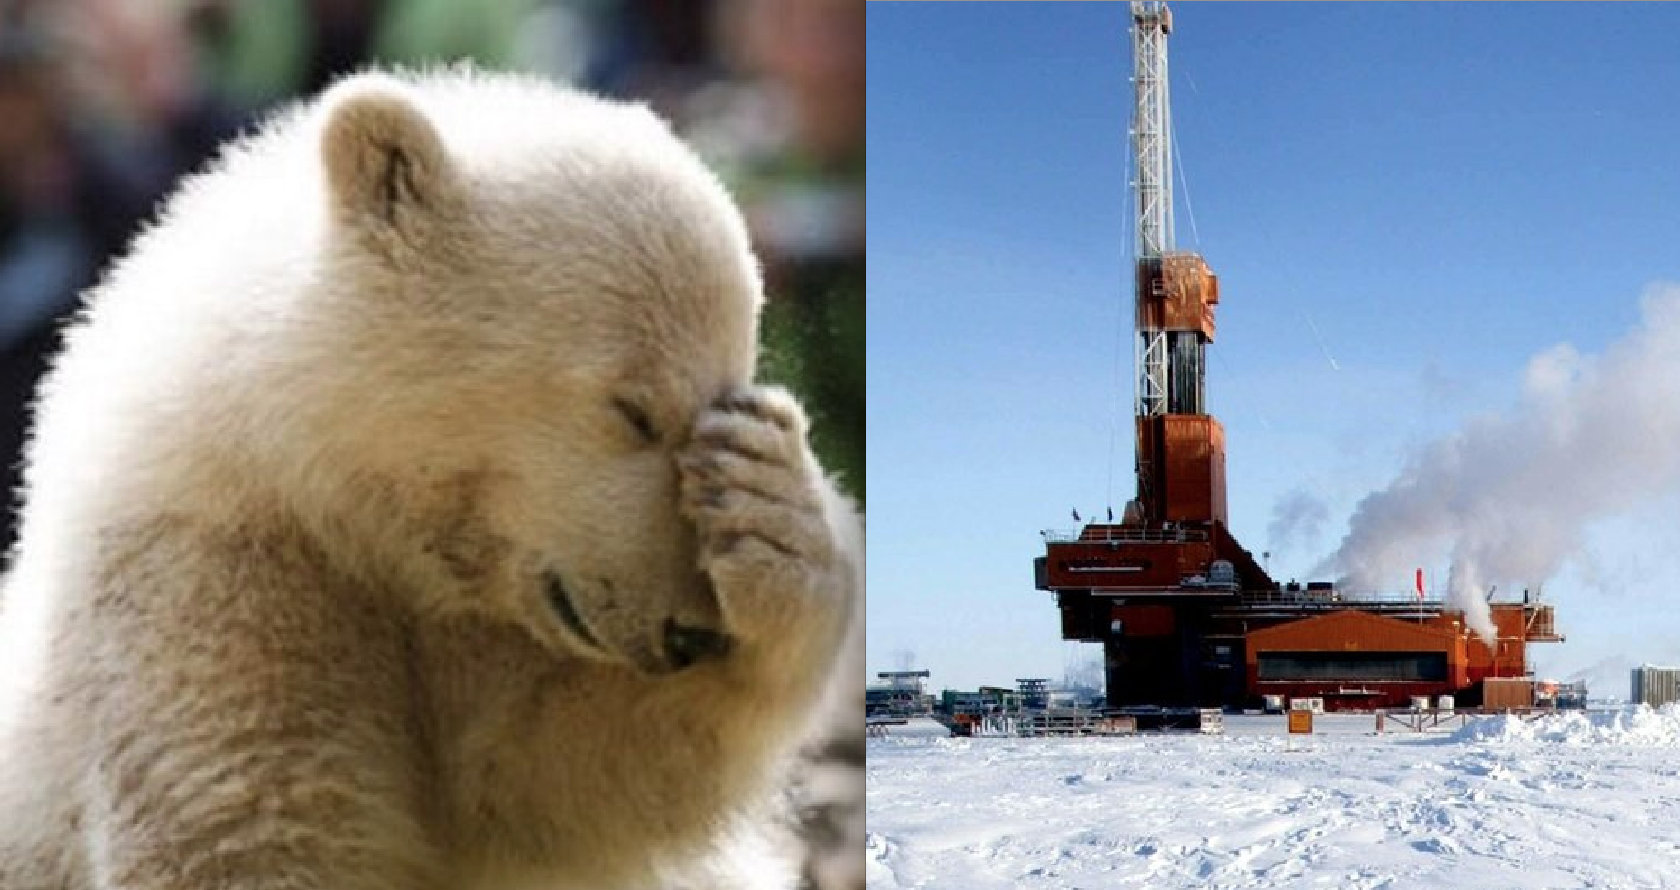 Trump Admin Approves Drilling Plan for Arctic National Wildlife Refuge as Big Banks, Oil Investors Flee